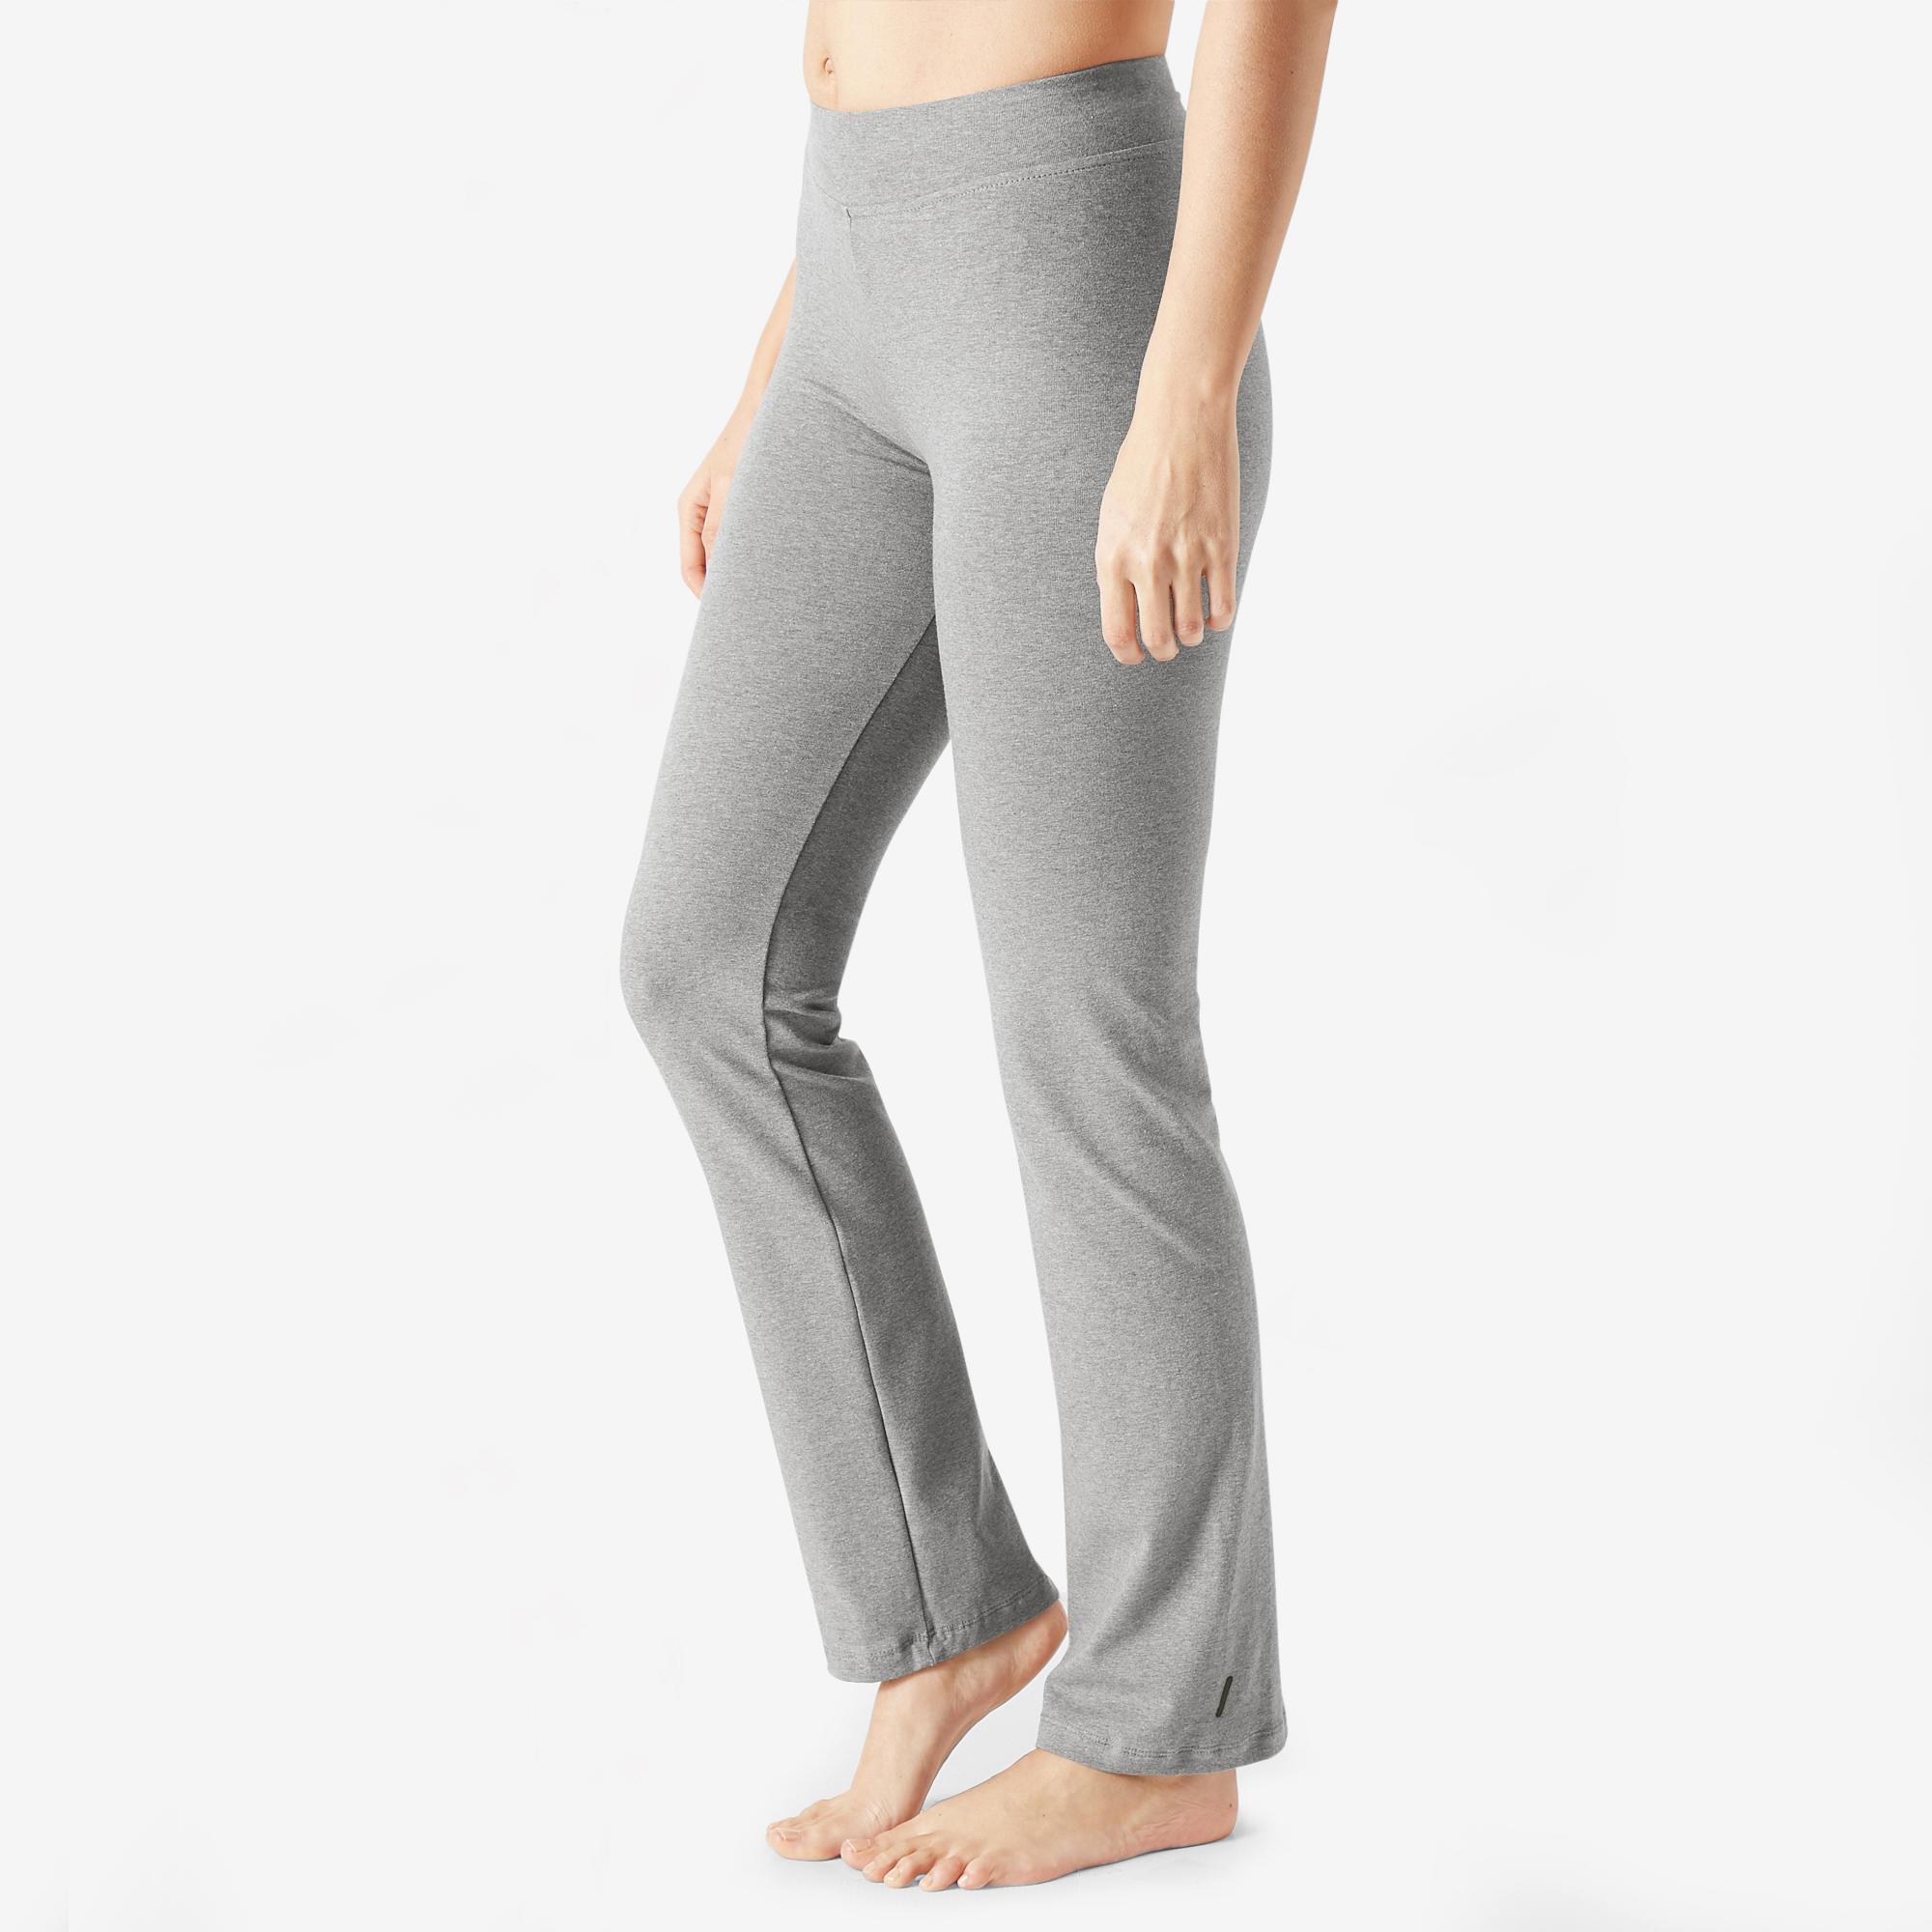 Pantalon FIT+ 500 damă